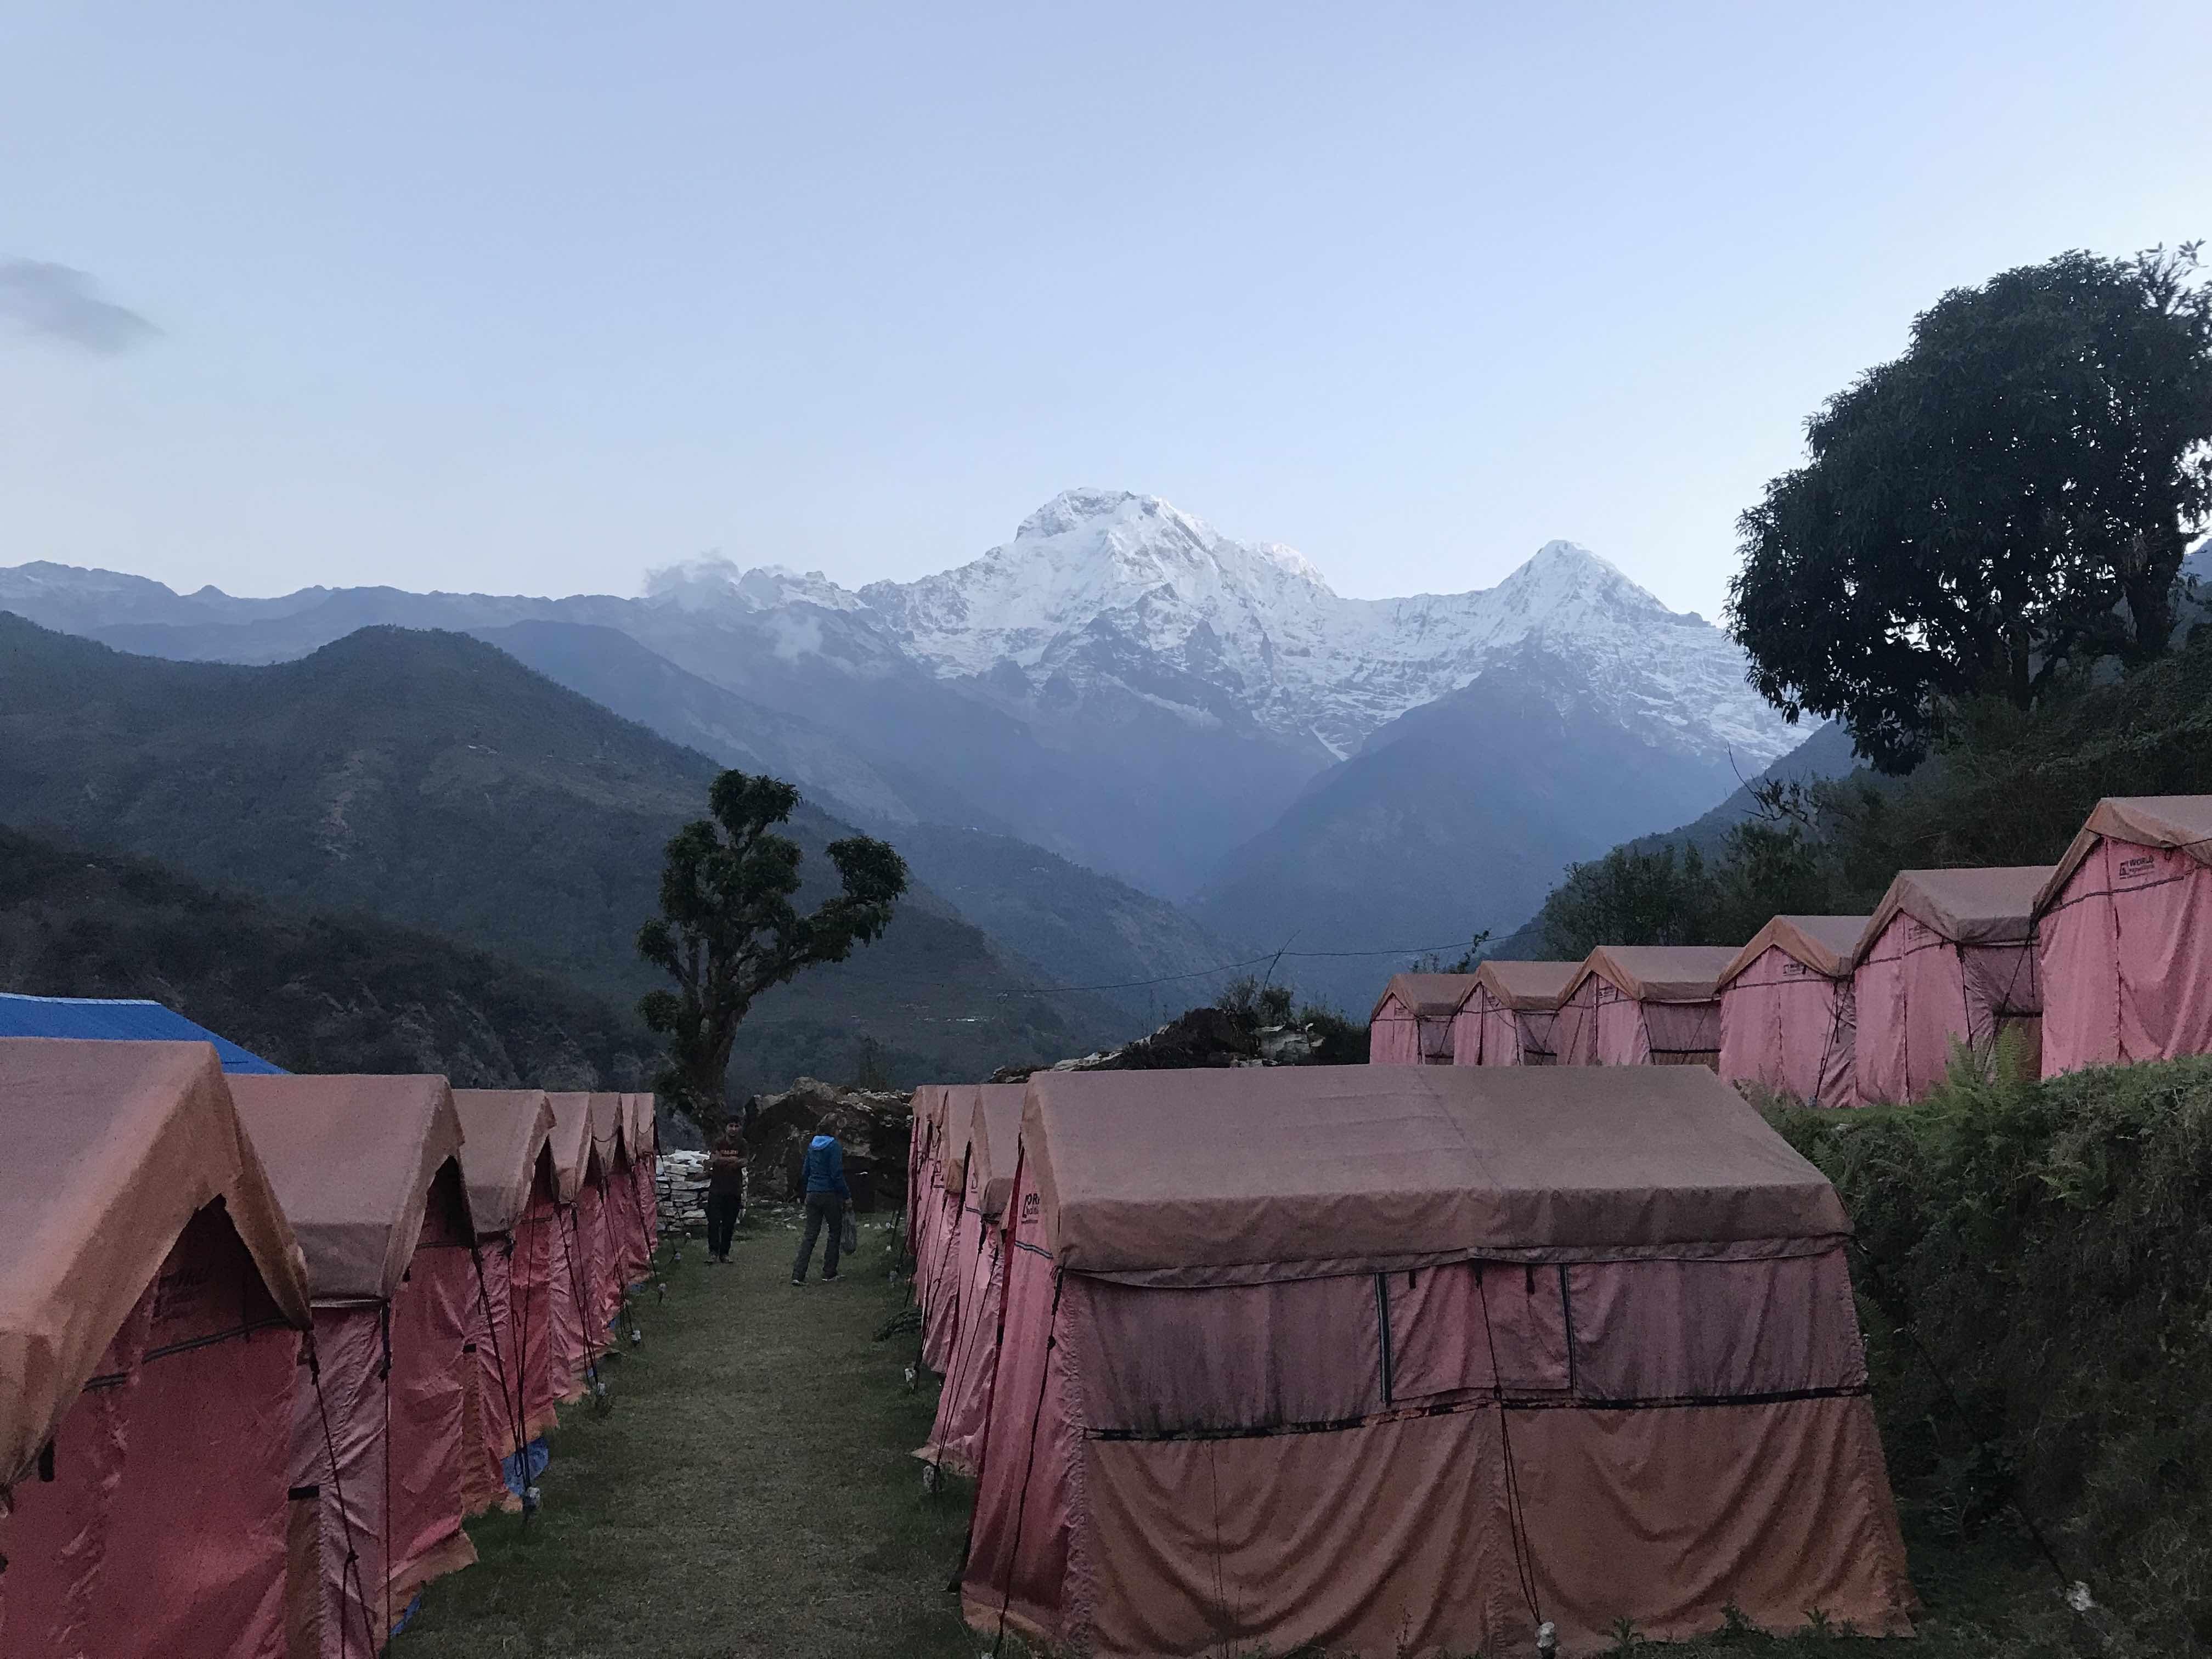 Annapurna South from Campsite